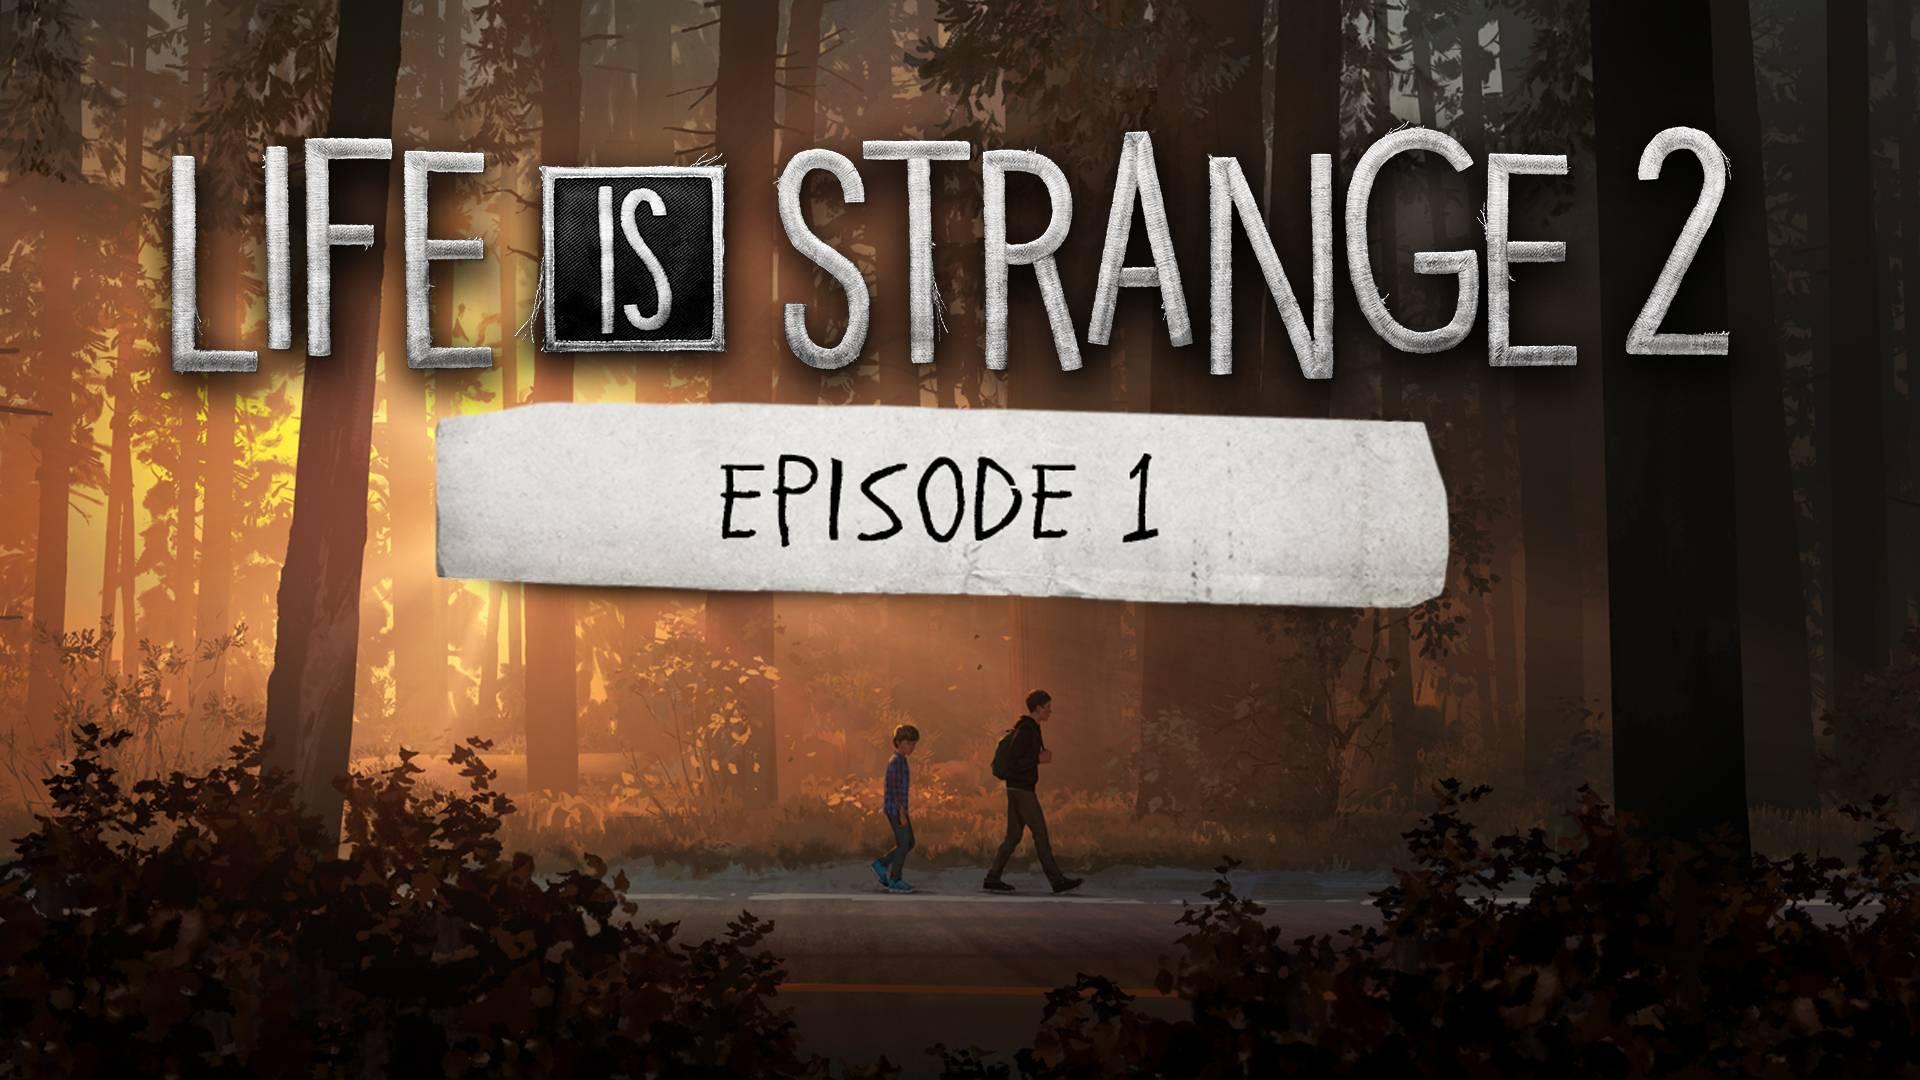 Life is Strange 2 (Episode 1)